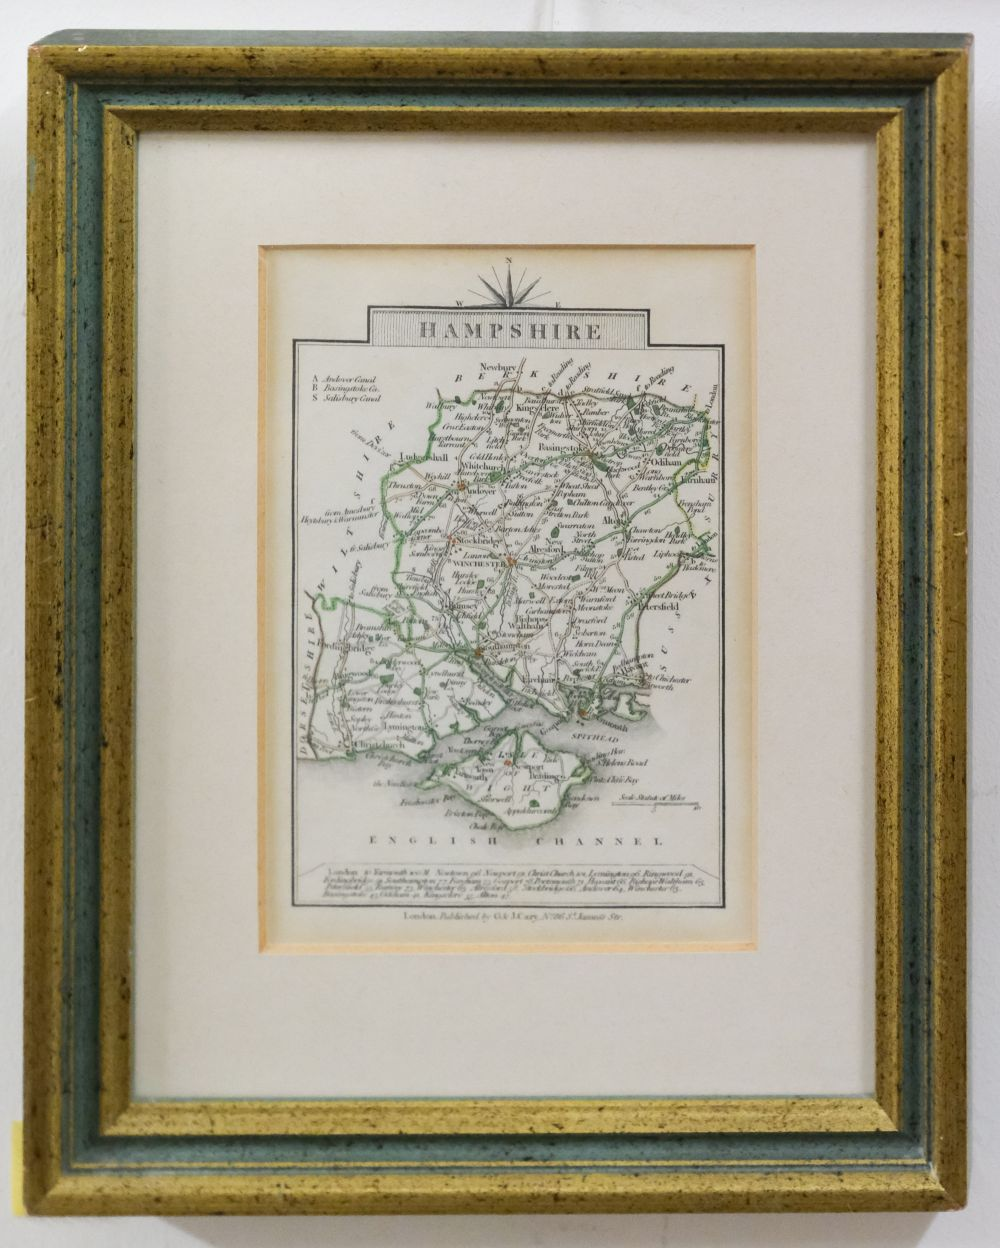 * Hampshire. Norden (J. & Hole G.), Hamshire olim pars Belgarum, circa 1637 - Image 6 of 7